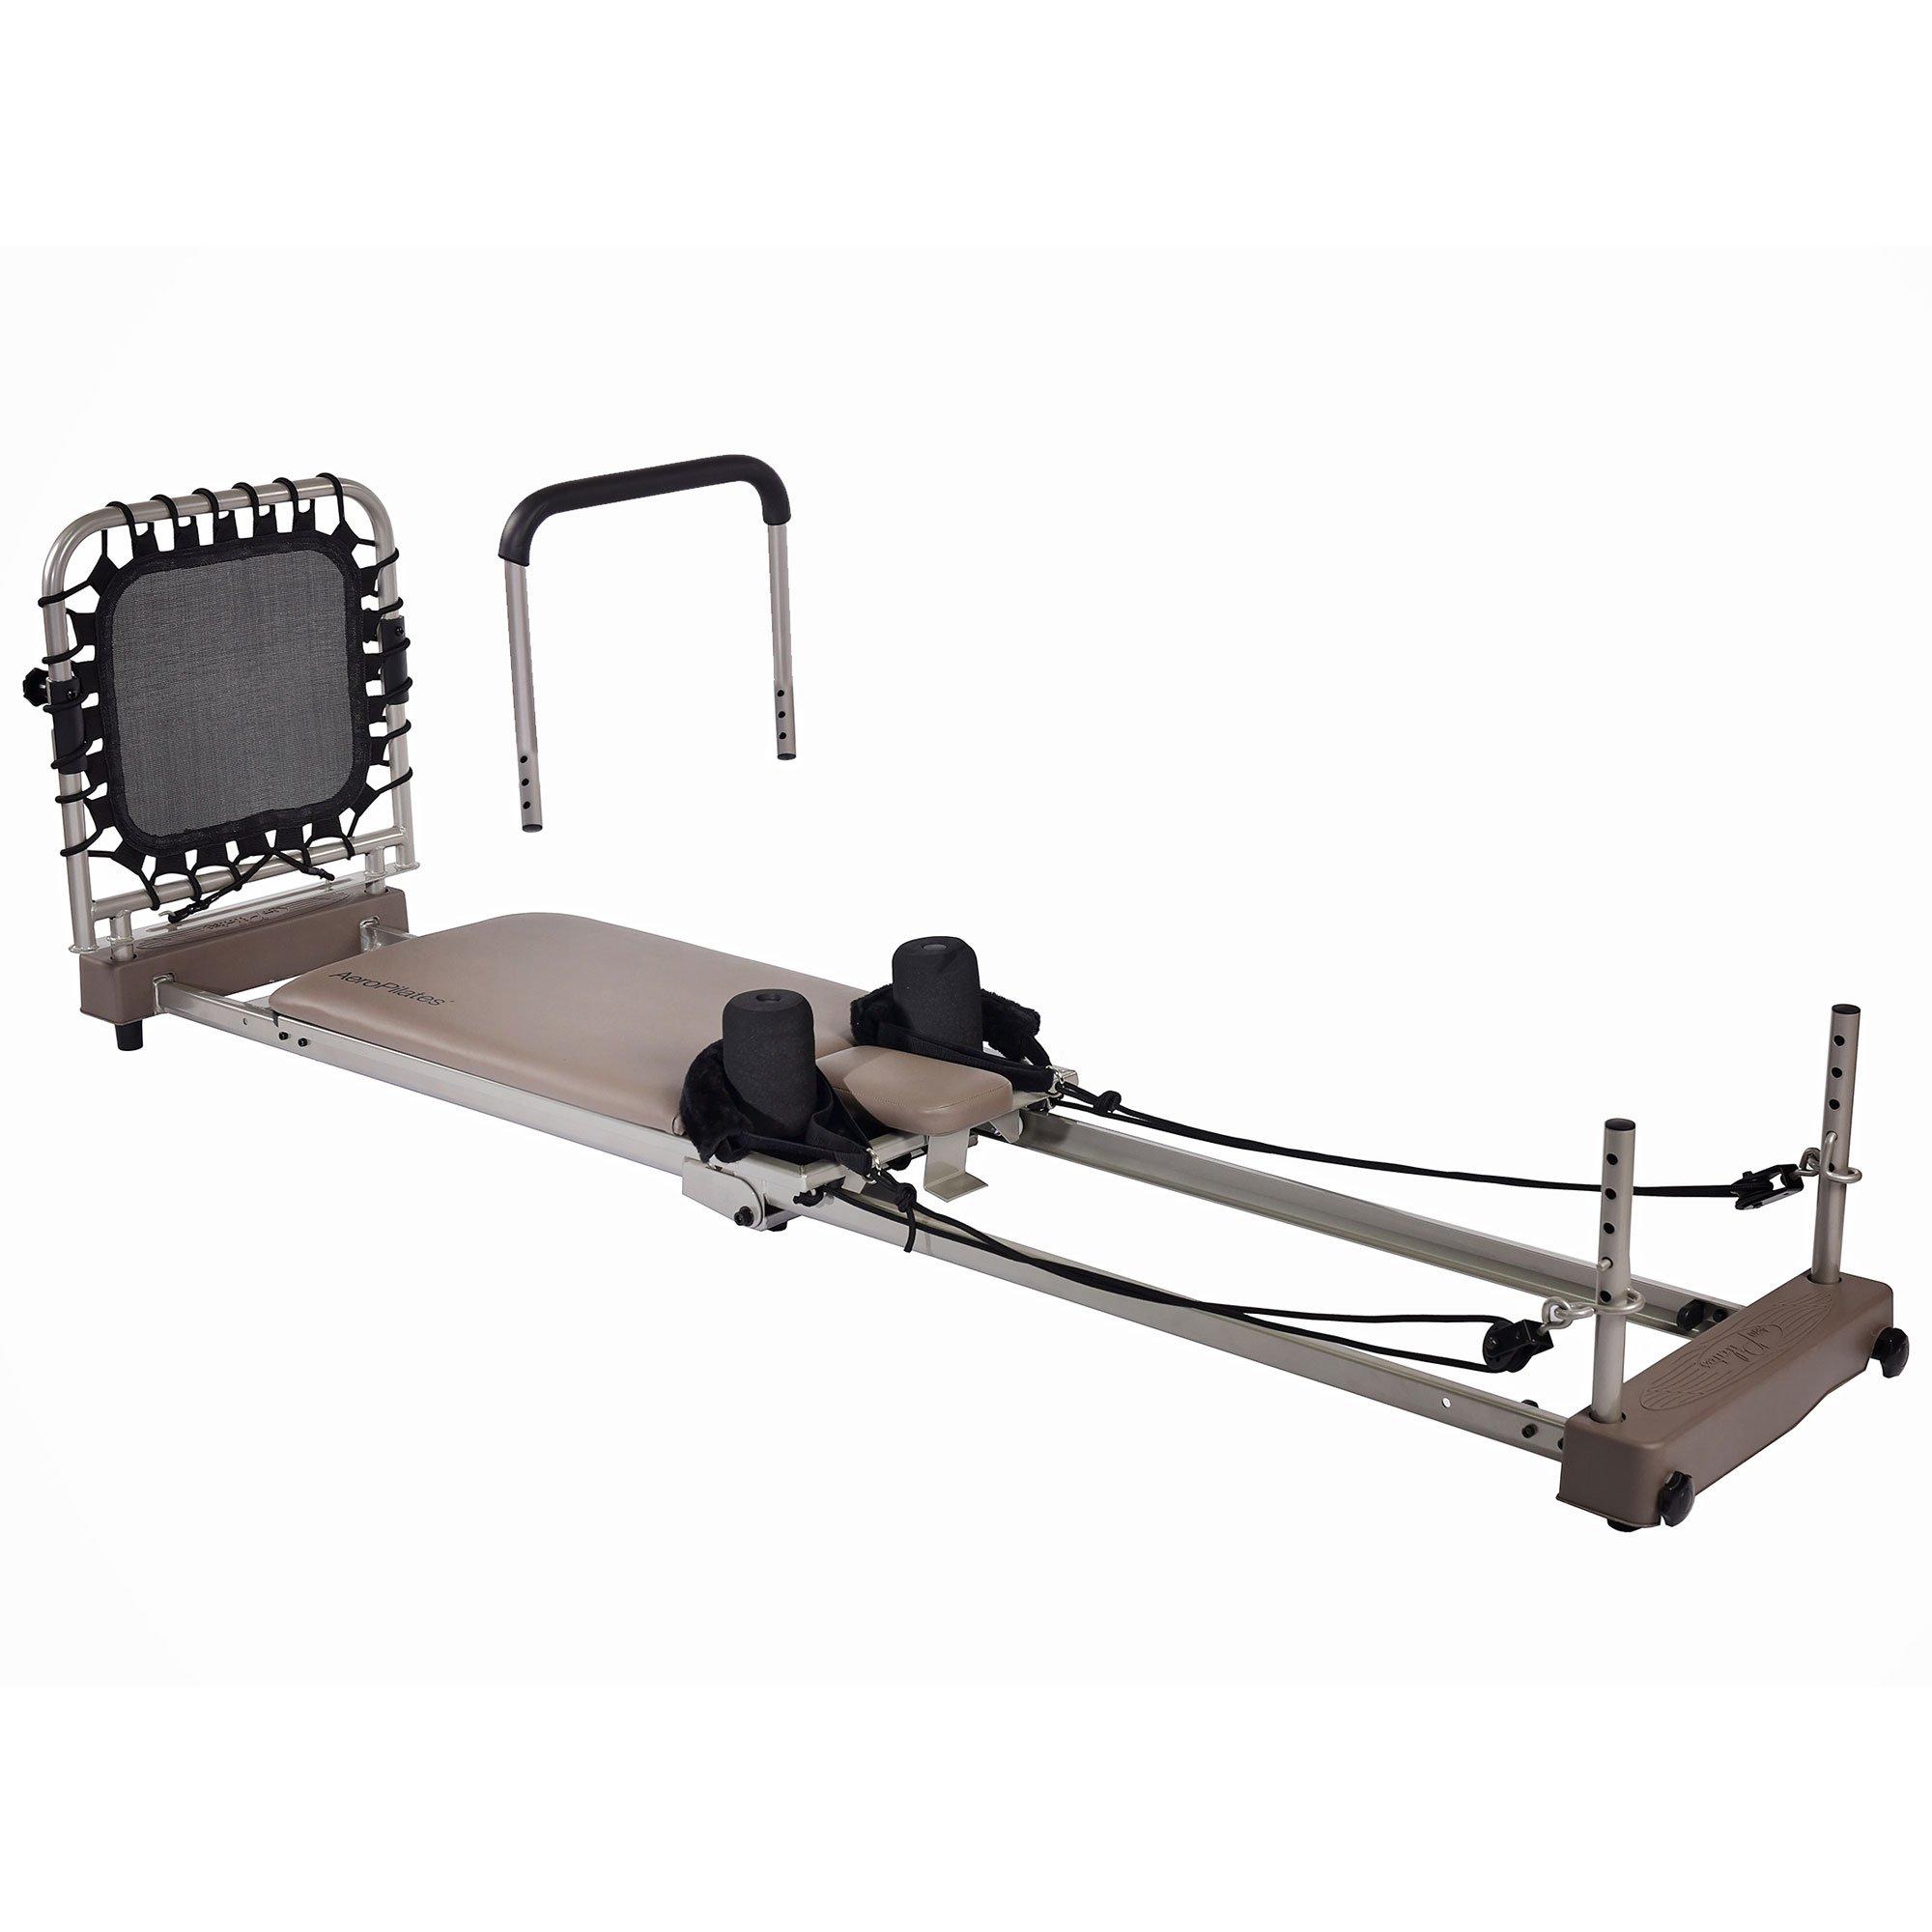 Stamina AeroPilates Reformer 369 Workout Fitness Machine with Cardio Rebounder